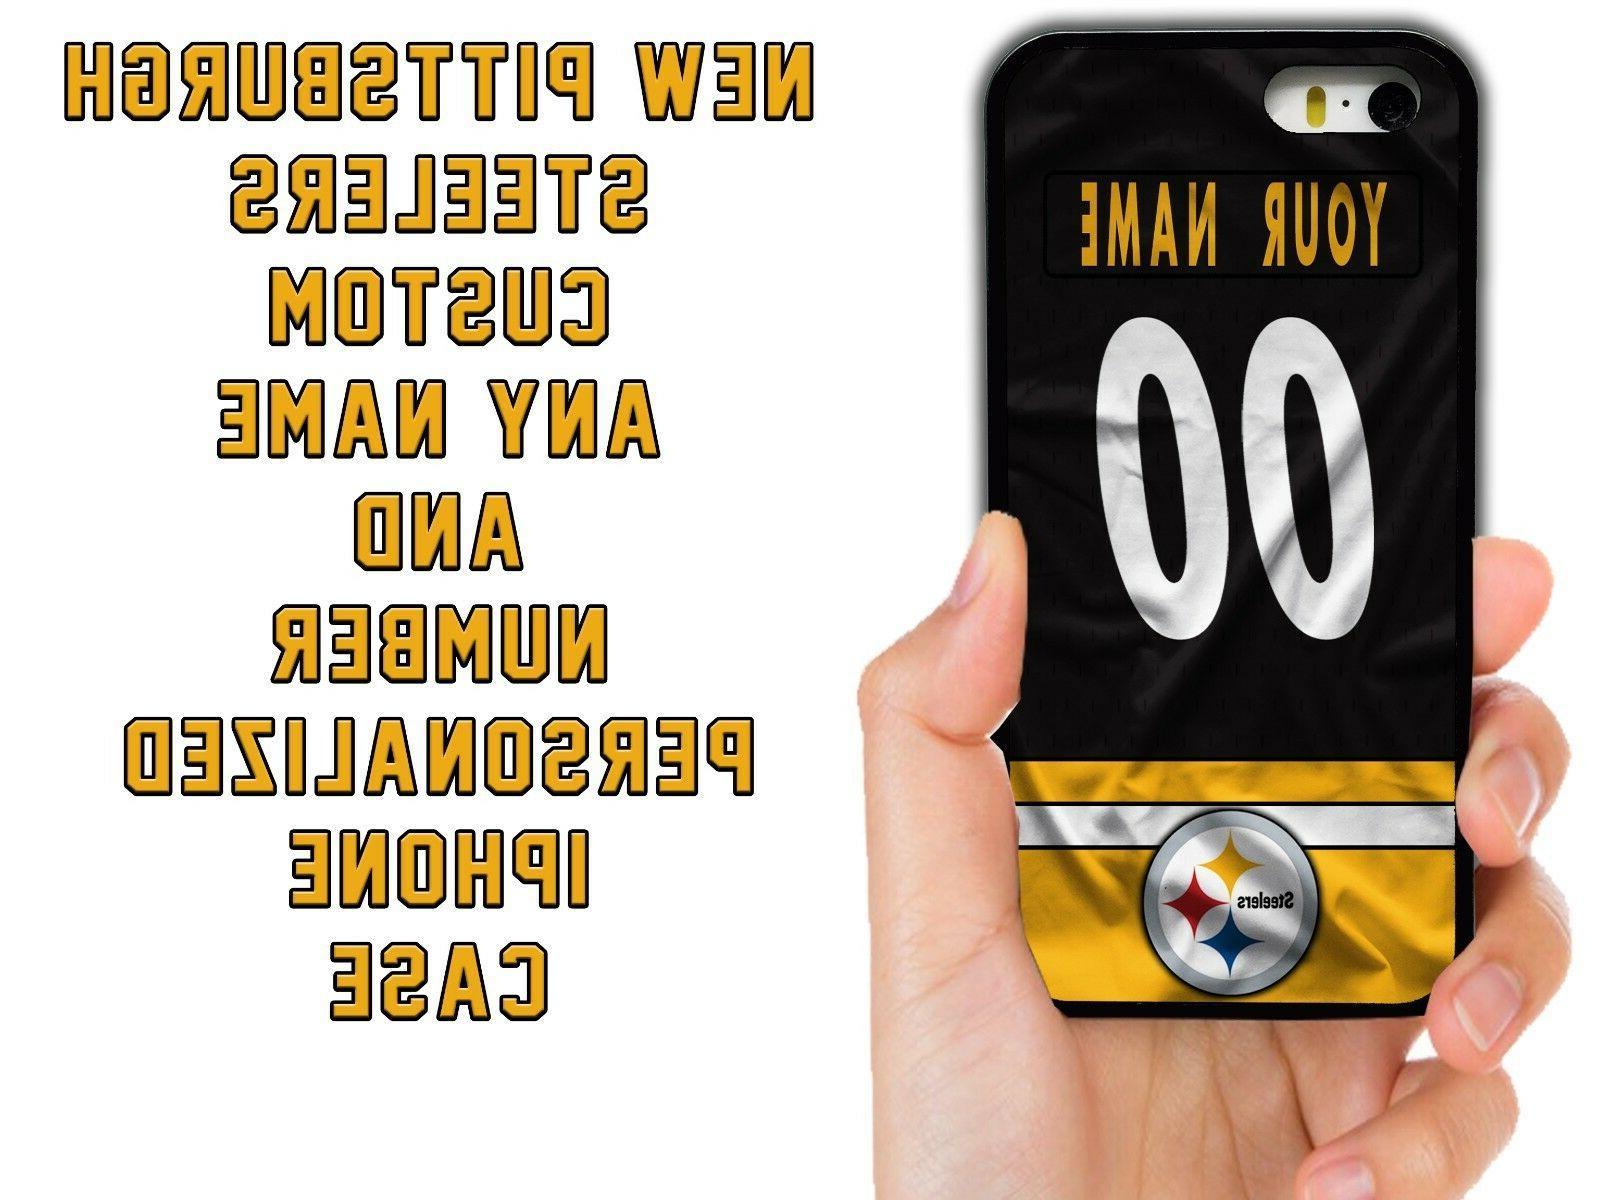 pittsburgh steelers nfl custom phone case cover